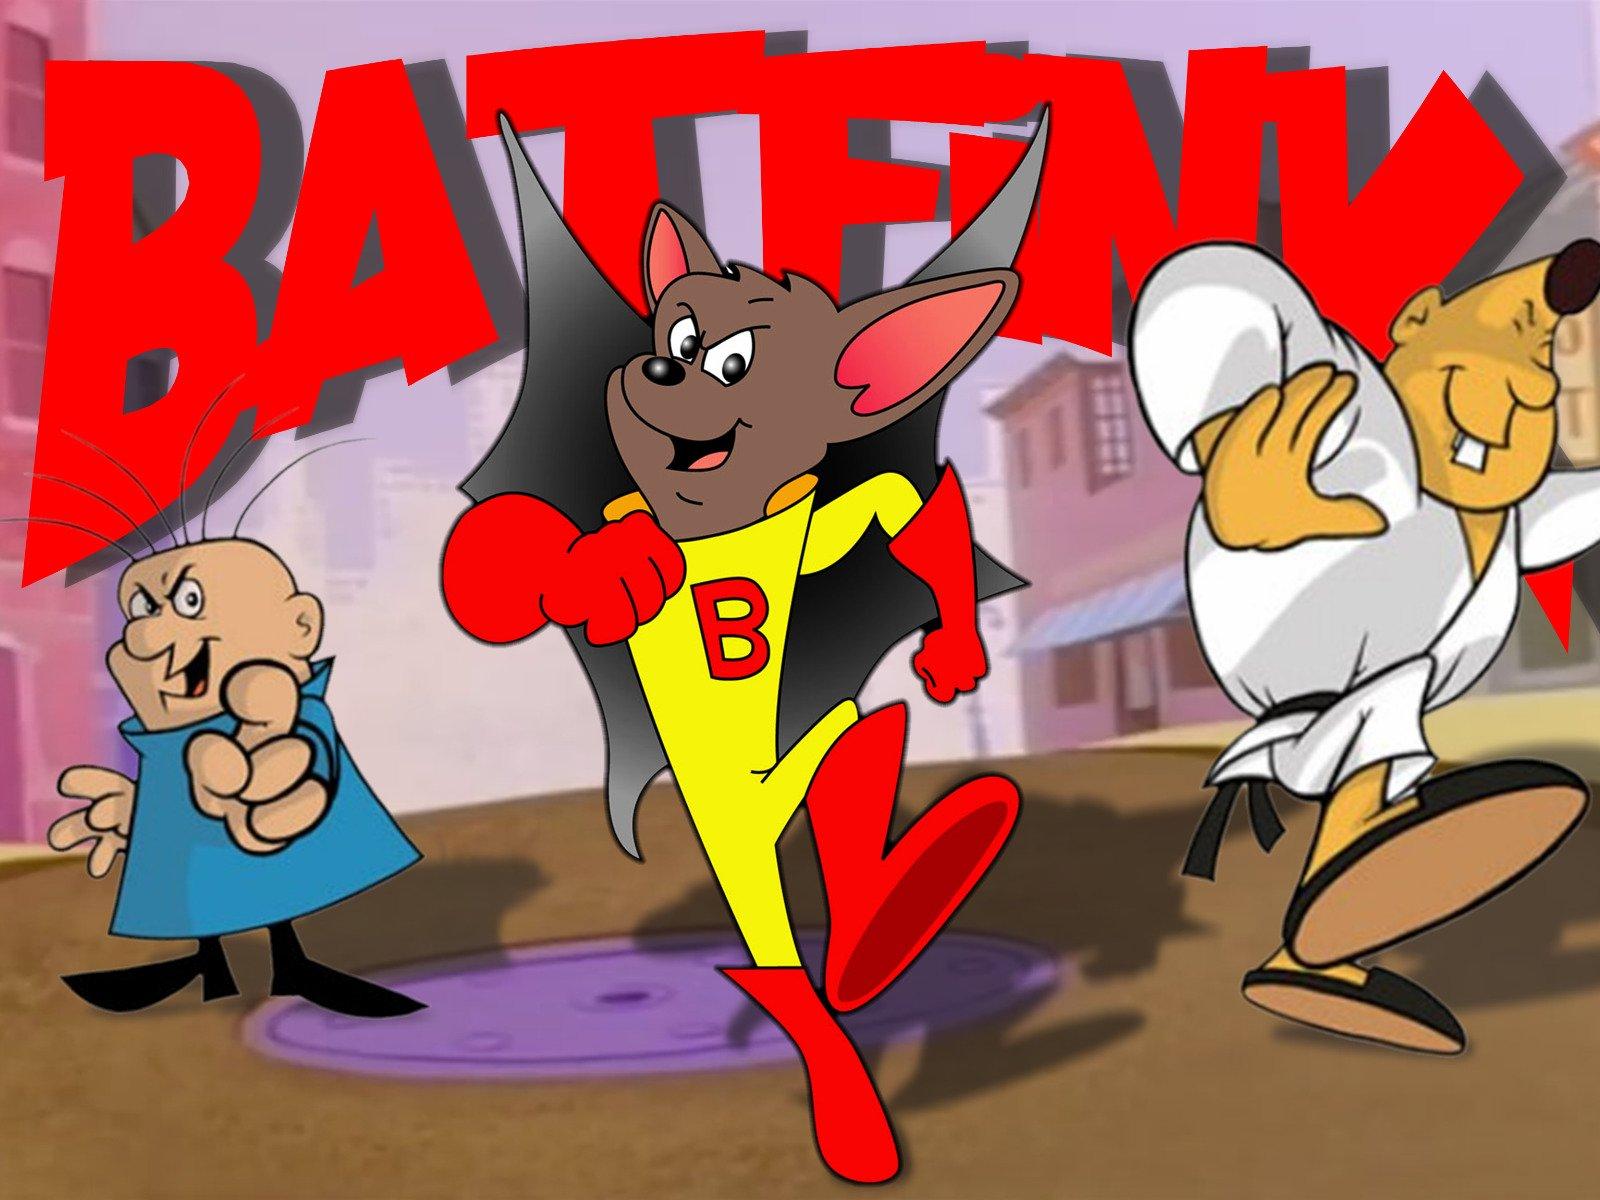 Batfink - Season 1